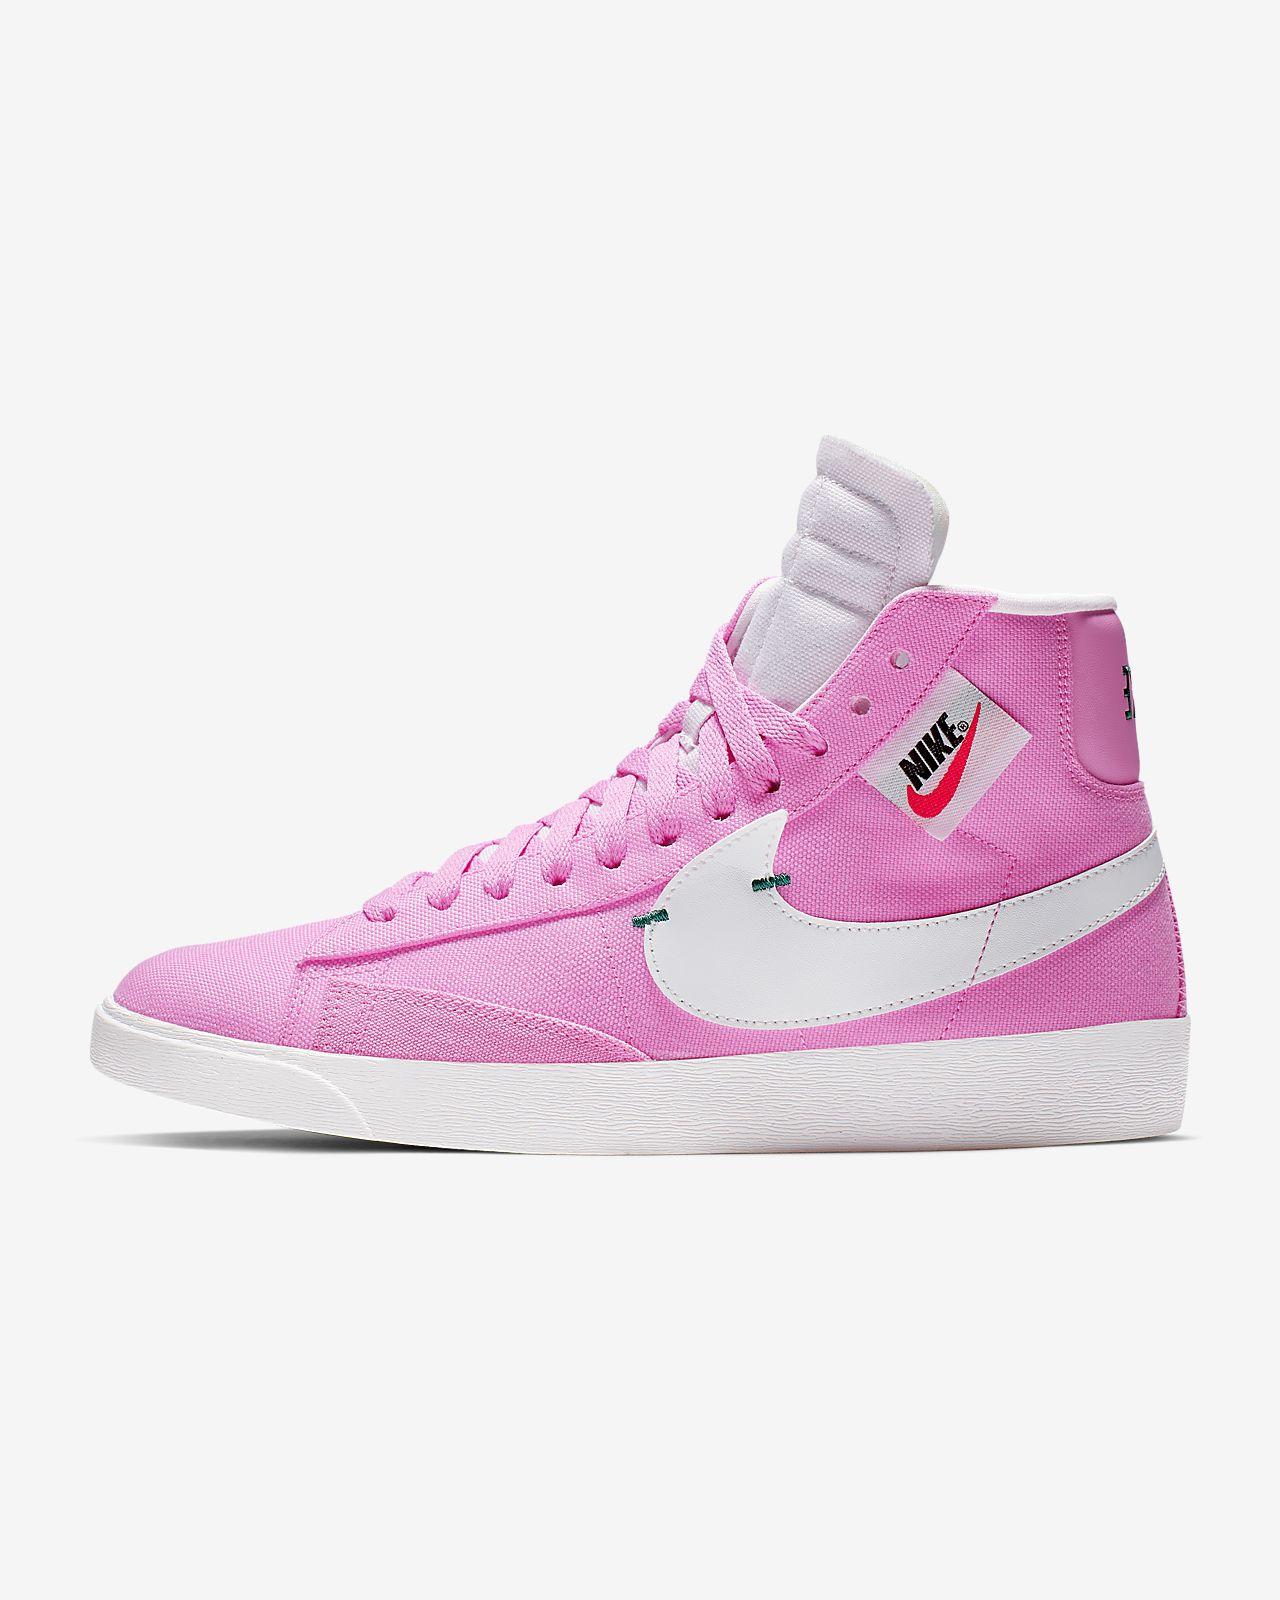 check out 8412b a7ab5 Sko Nike Blazer Mid Rebel för kvinnor